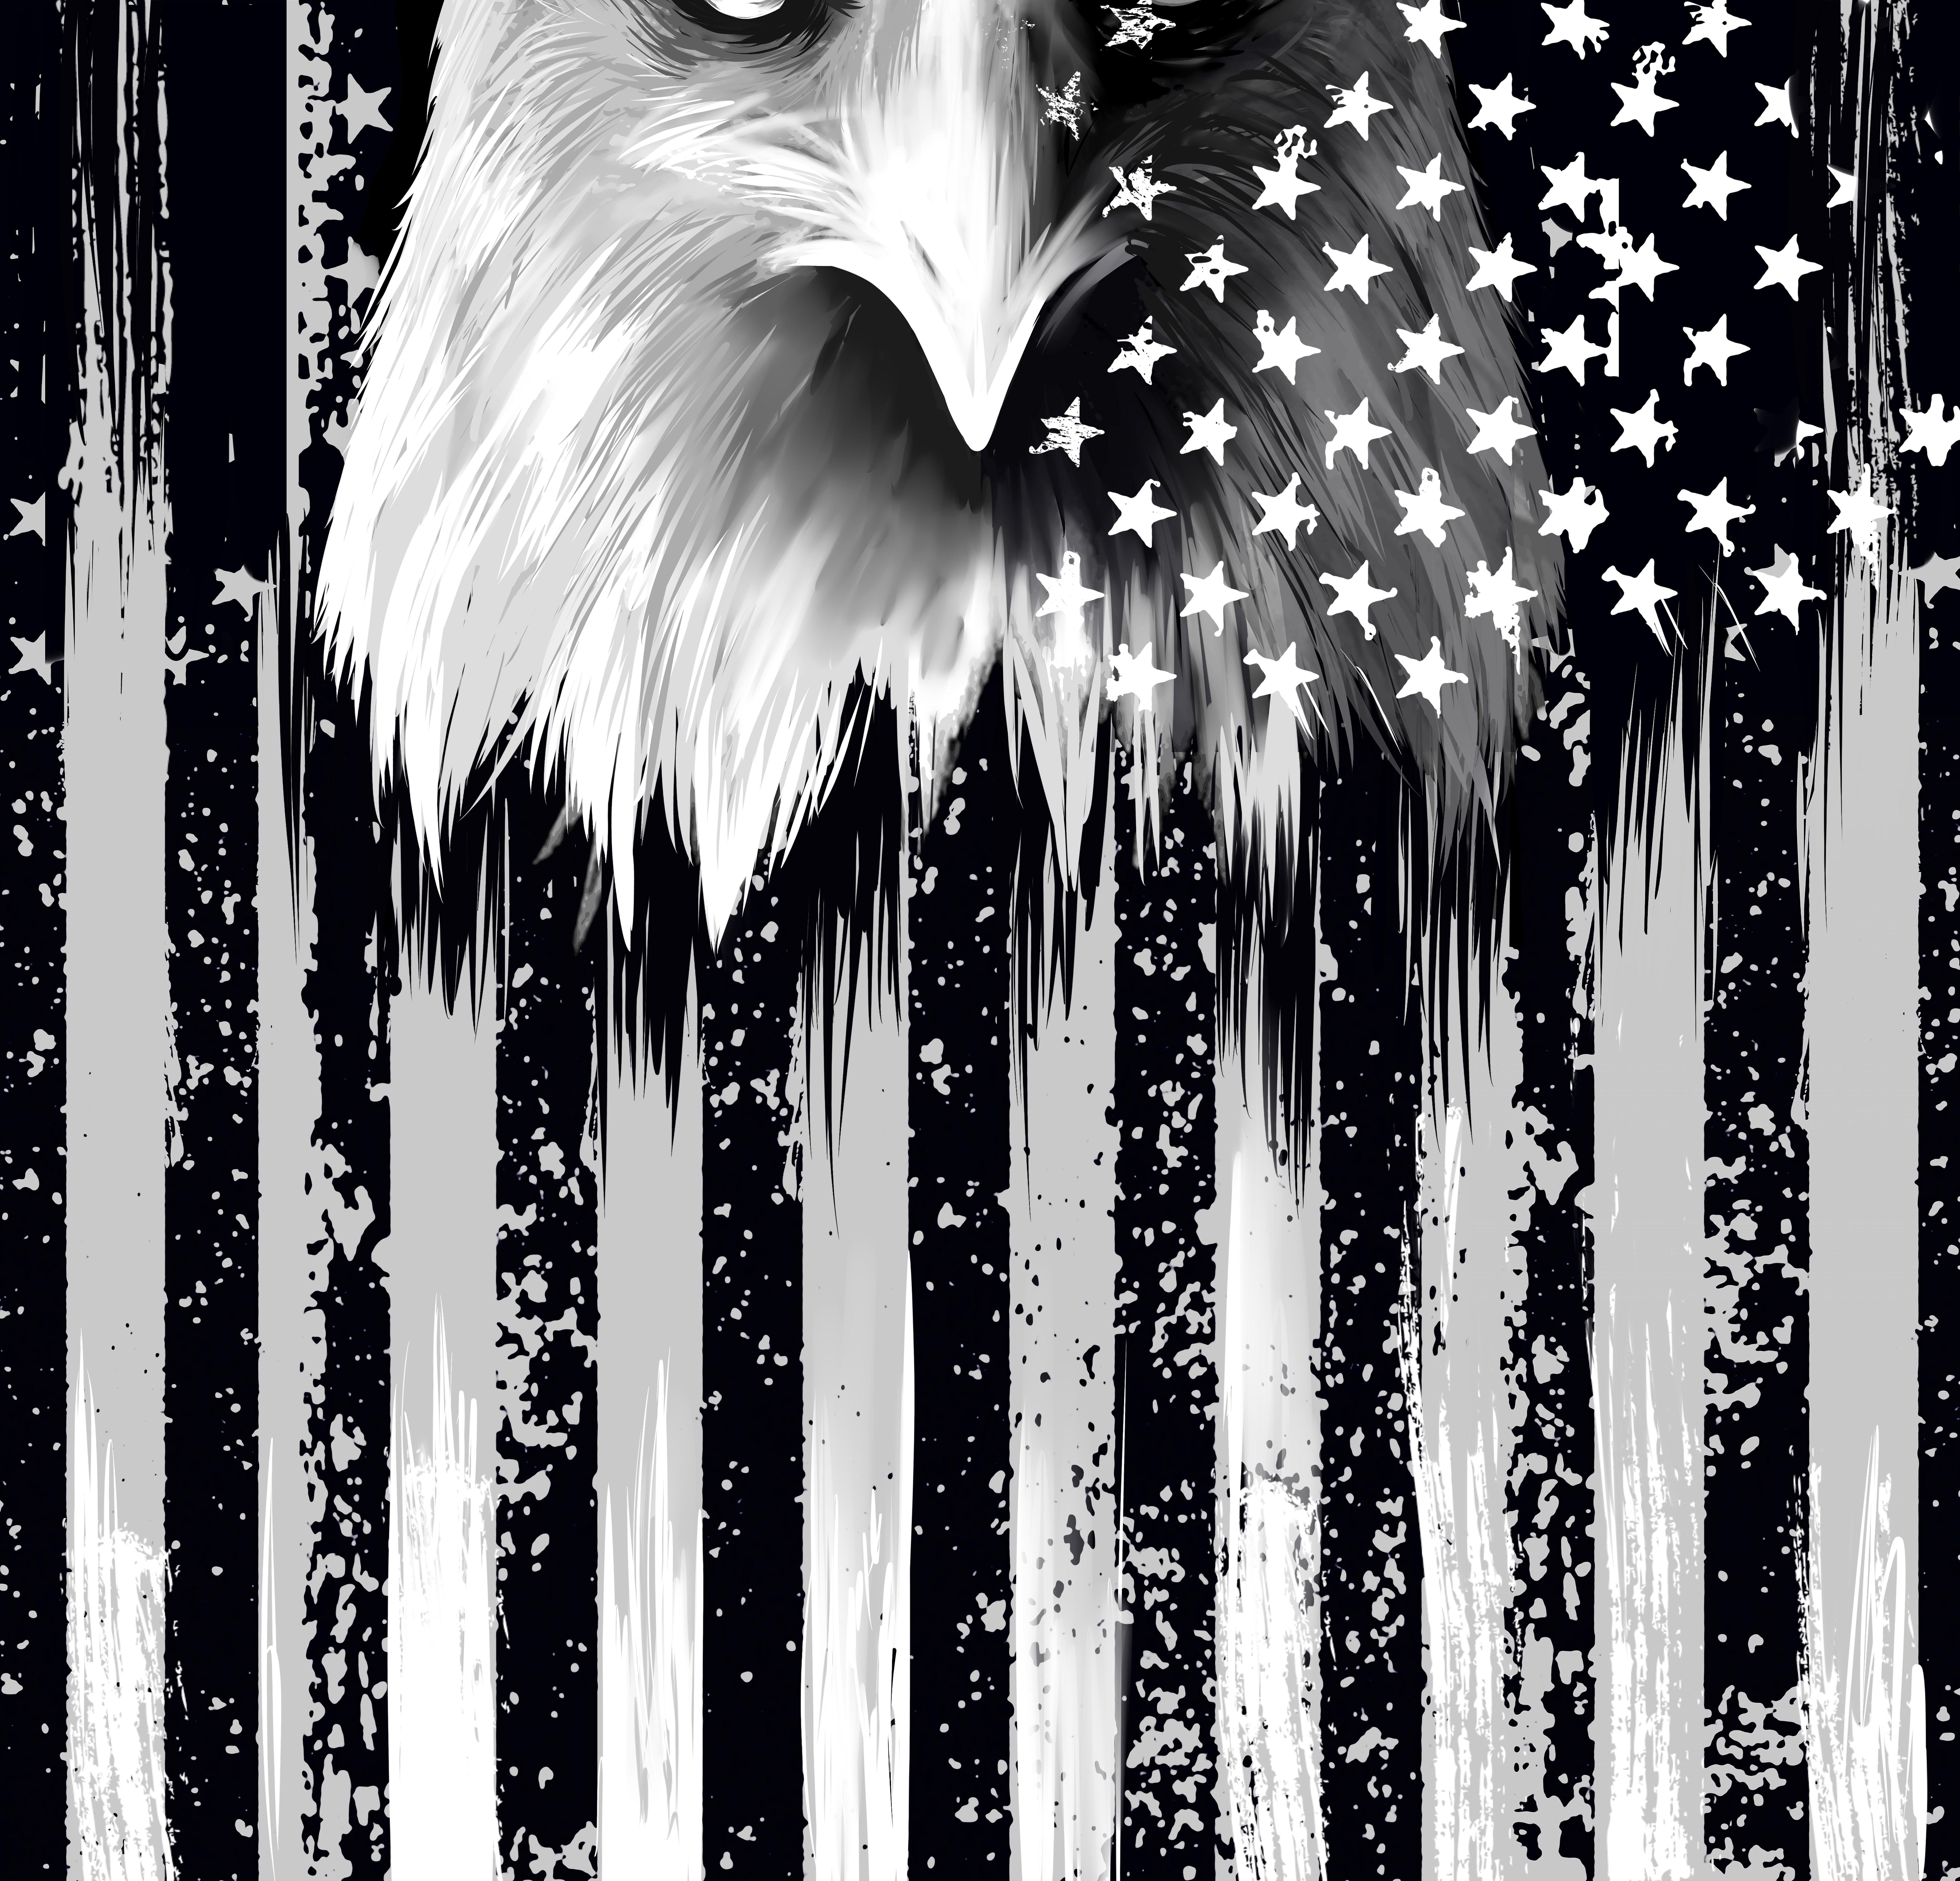 Patriotic American Tubular Bandana Protective Mask Design